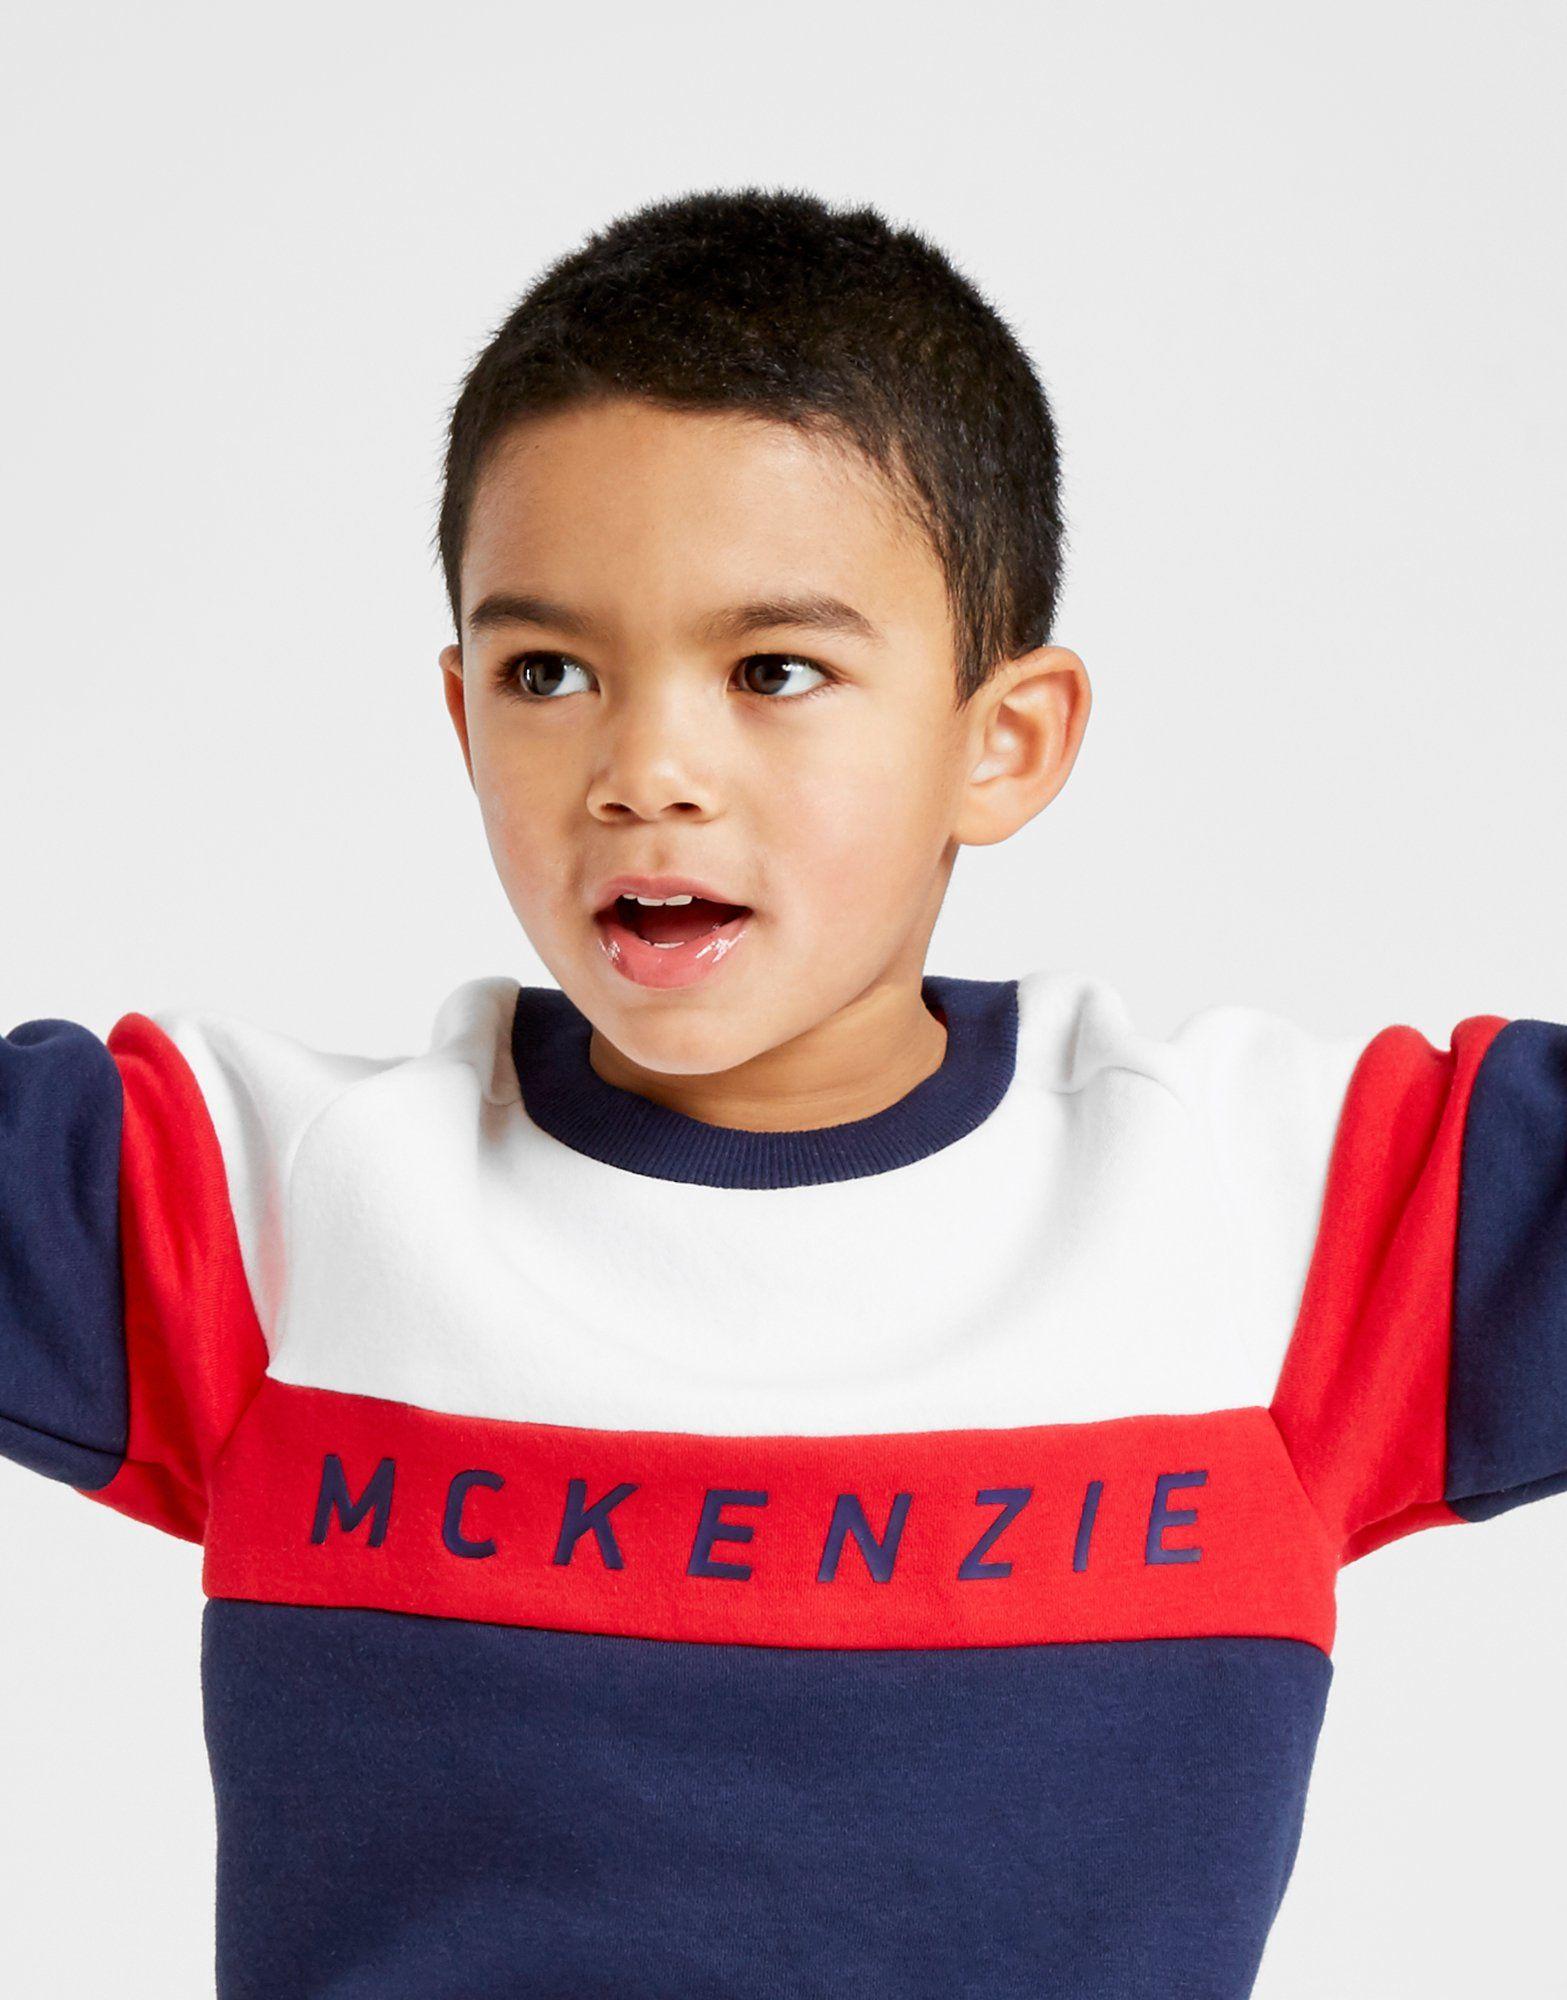 McKenzie Tristan Crew Tracksuit Children